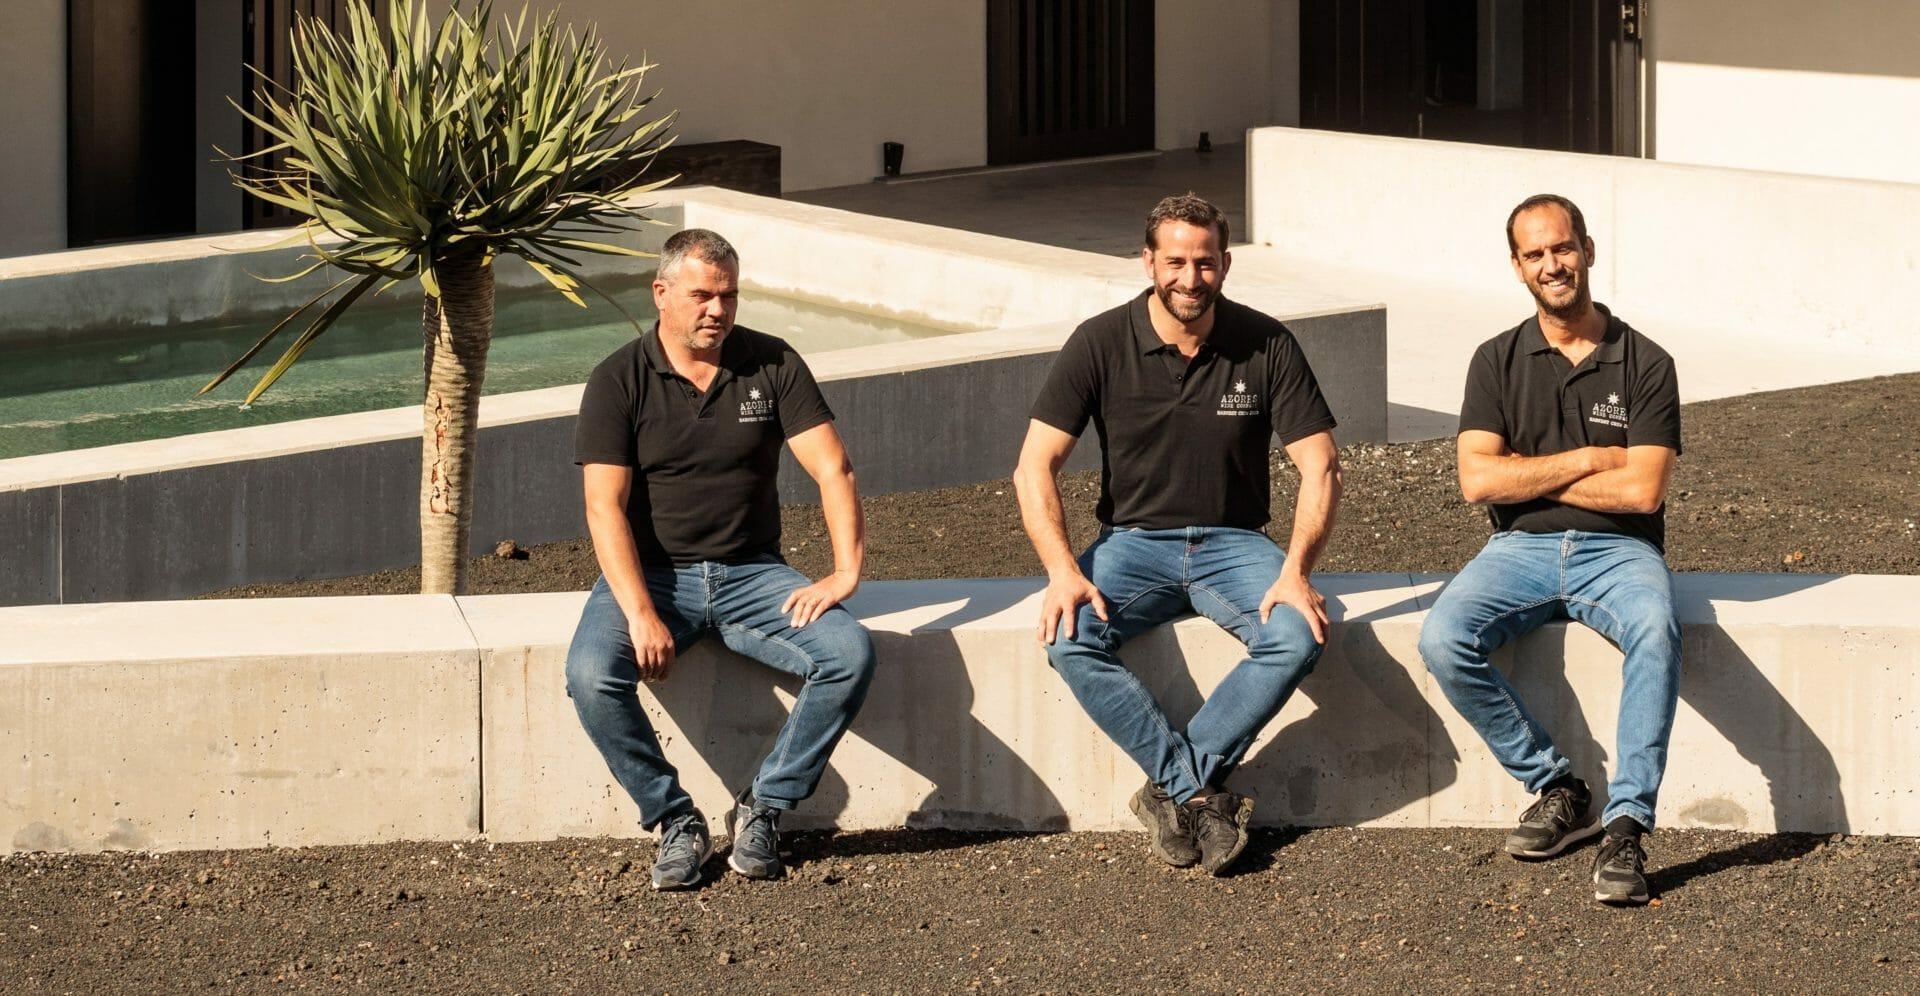 Azores Wine Company